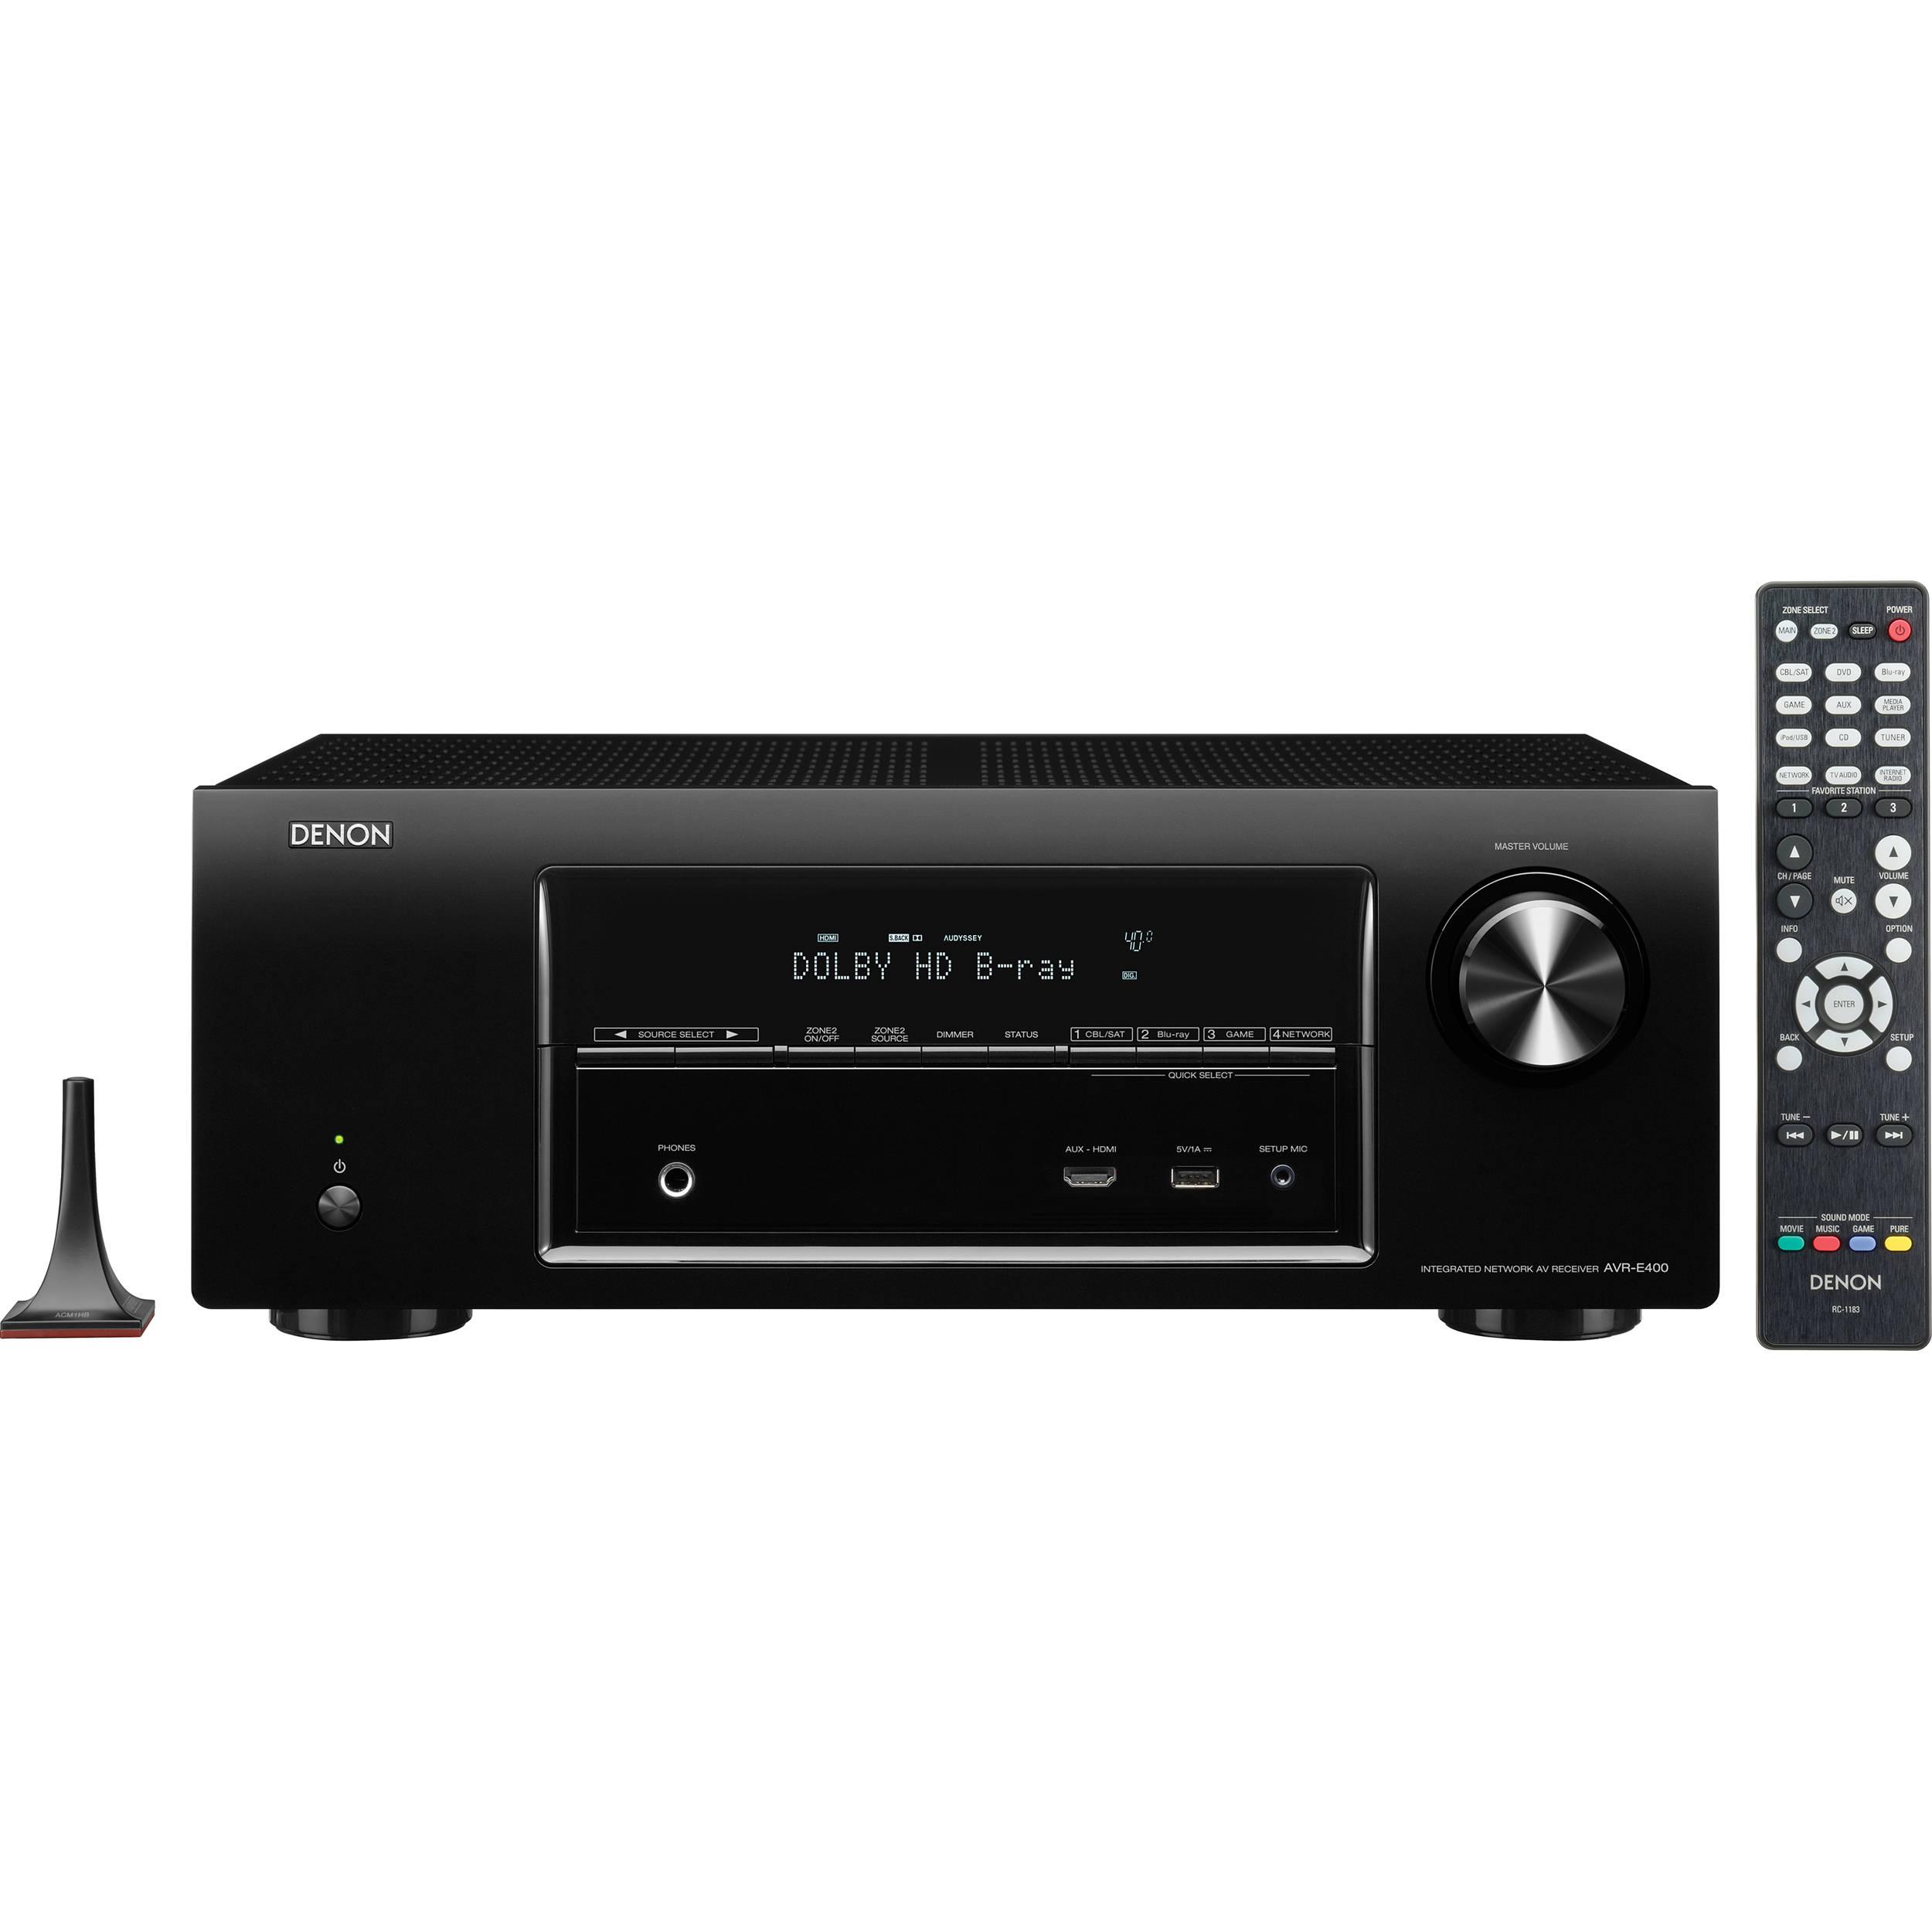 denon avr e400 7 1 channel network home theater receiver. Black Bedroom Furniture Sets. Home Design Ideas